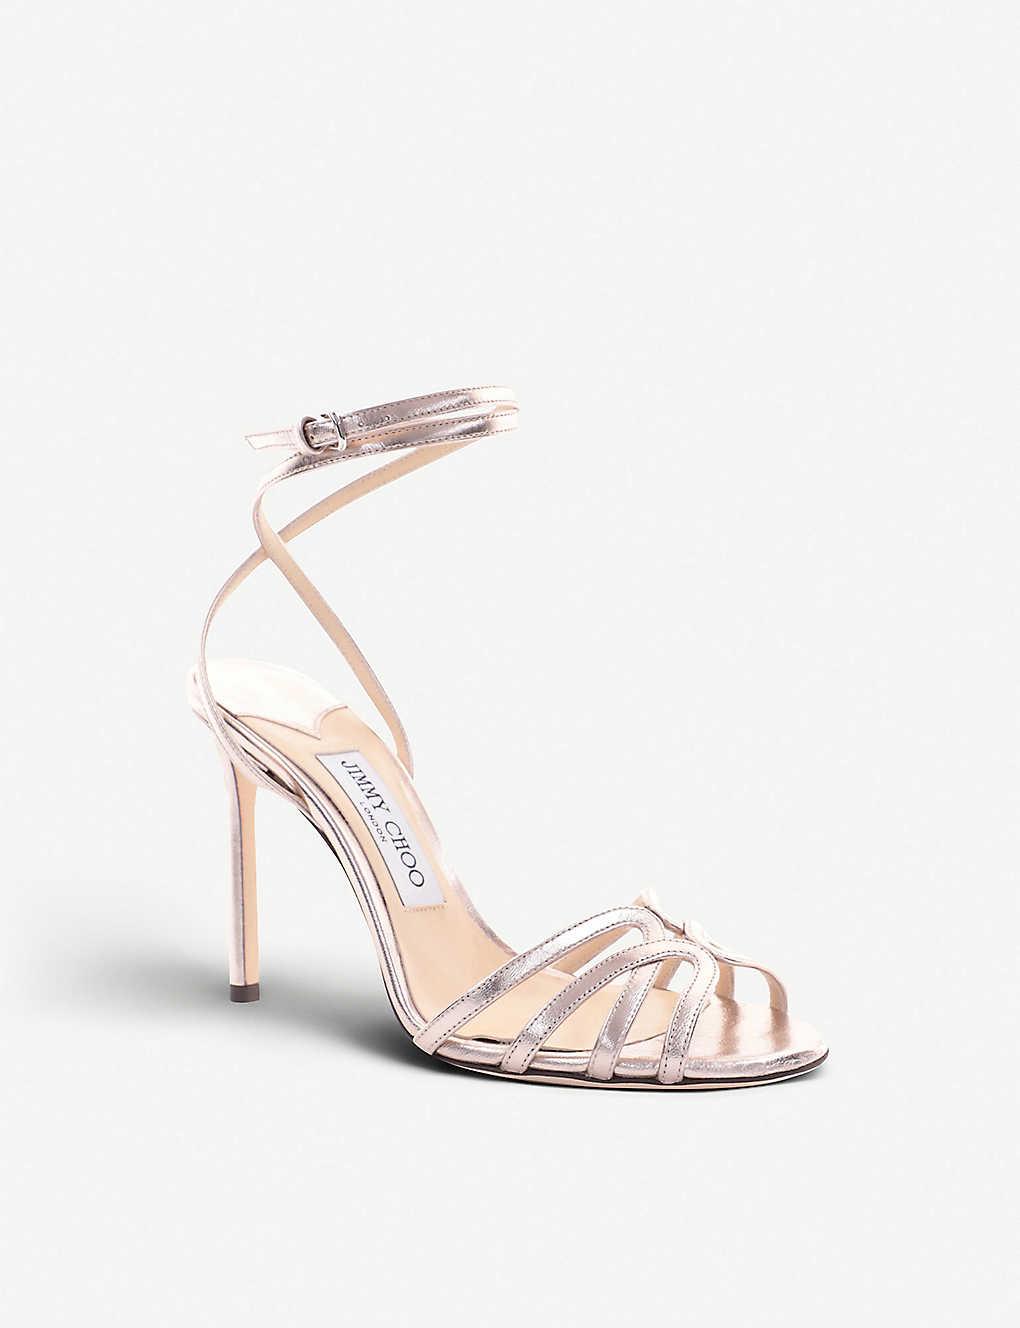 58090ce1c168 ... Mimi 100 metallic leather heeled sandals - Platinum ...